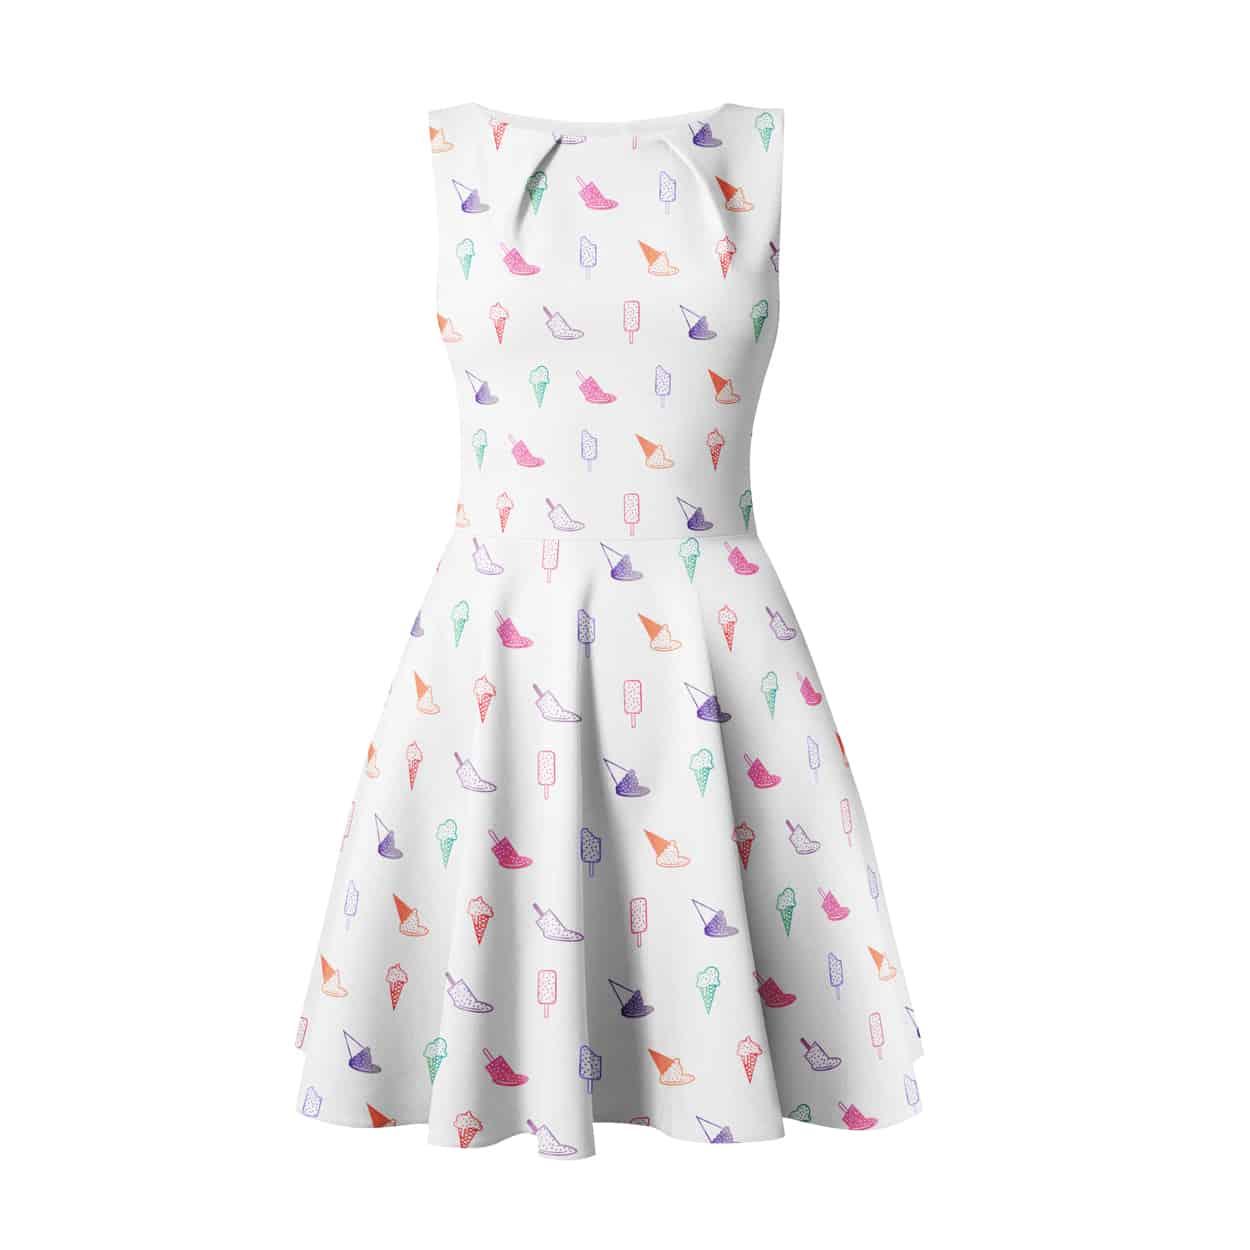 branched off - summer melt - pattern design (dress, leggings, crop tank top)